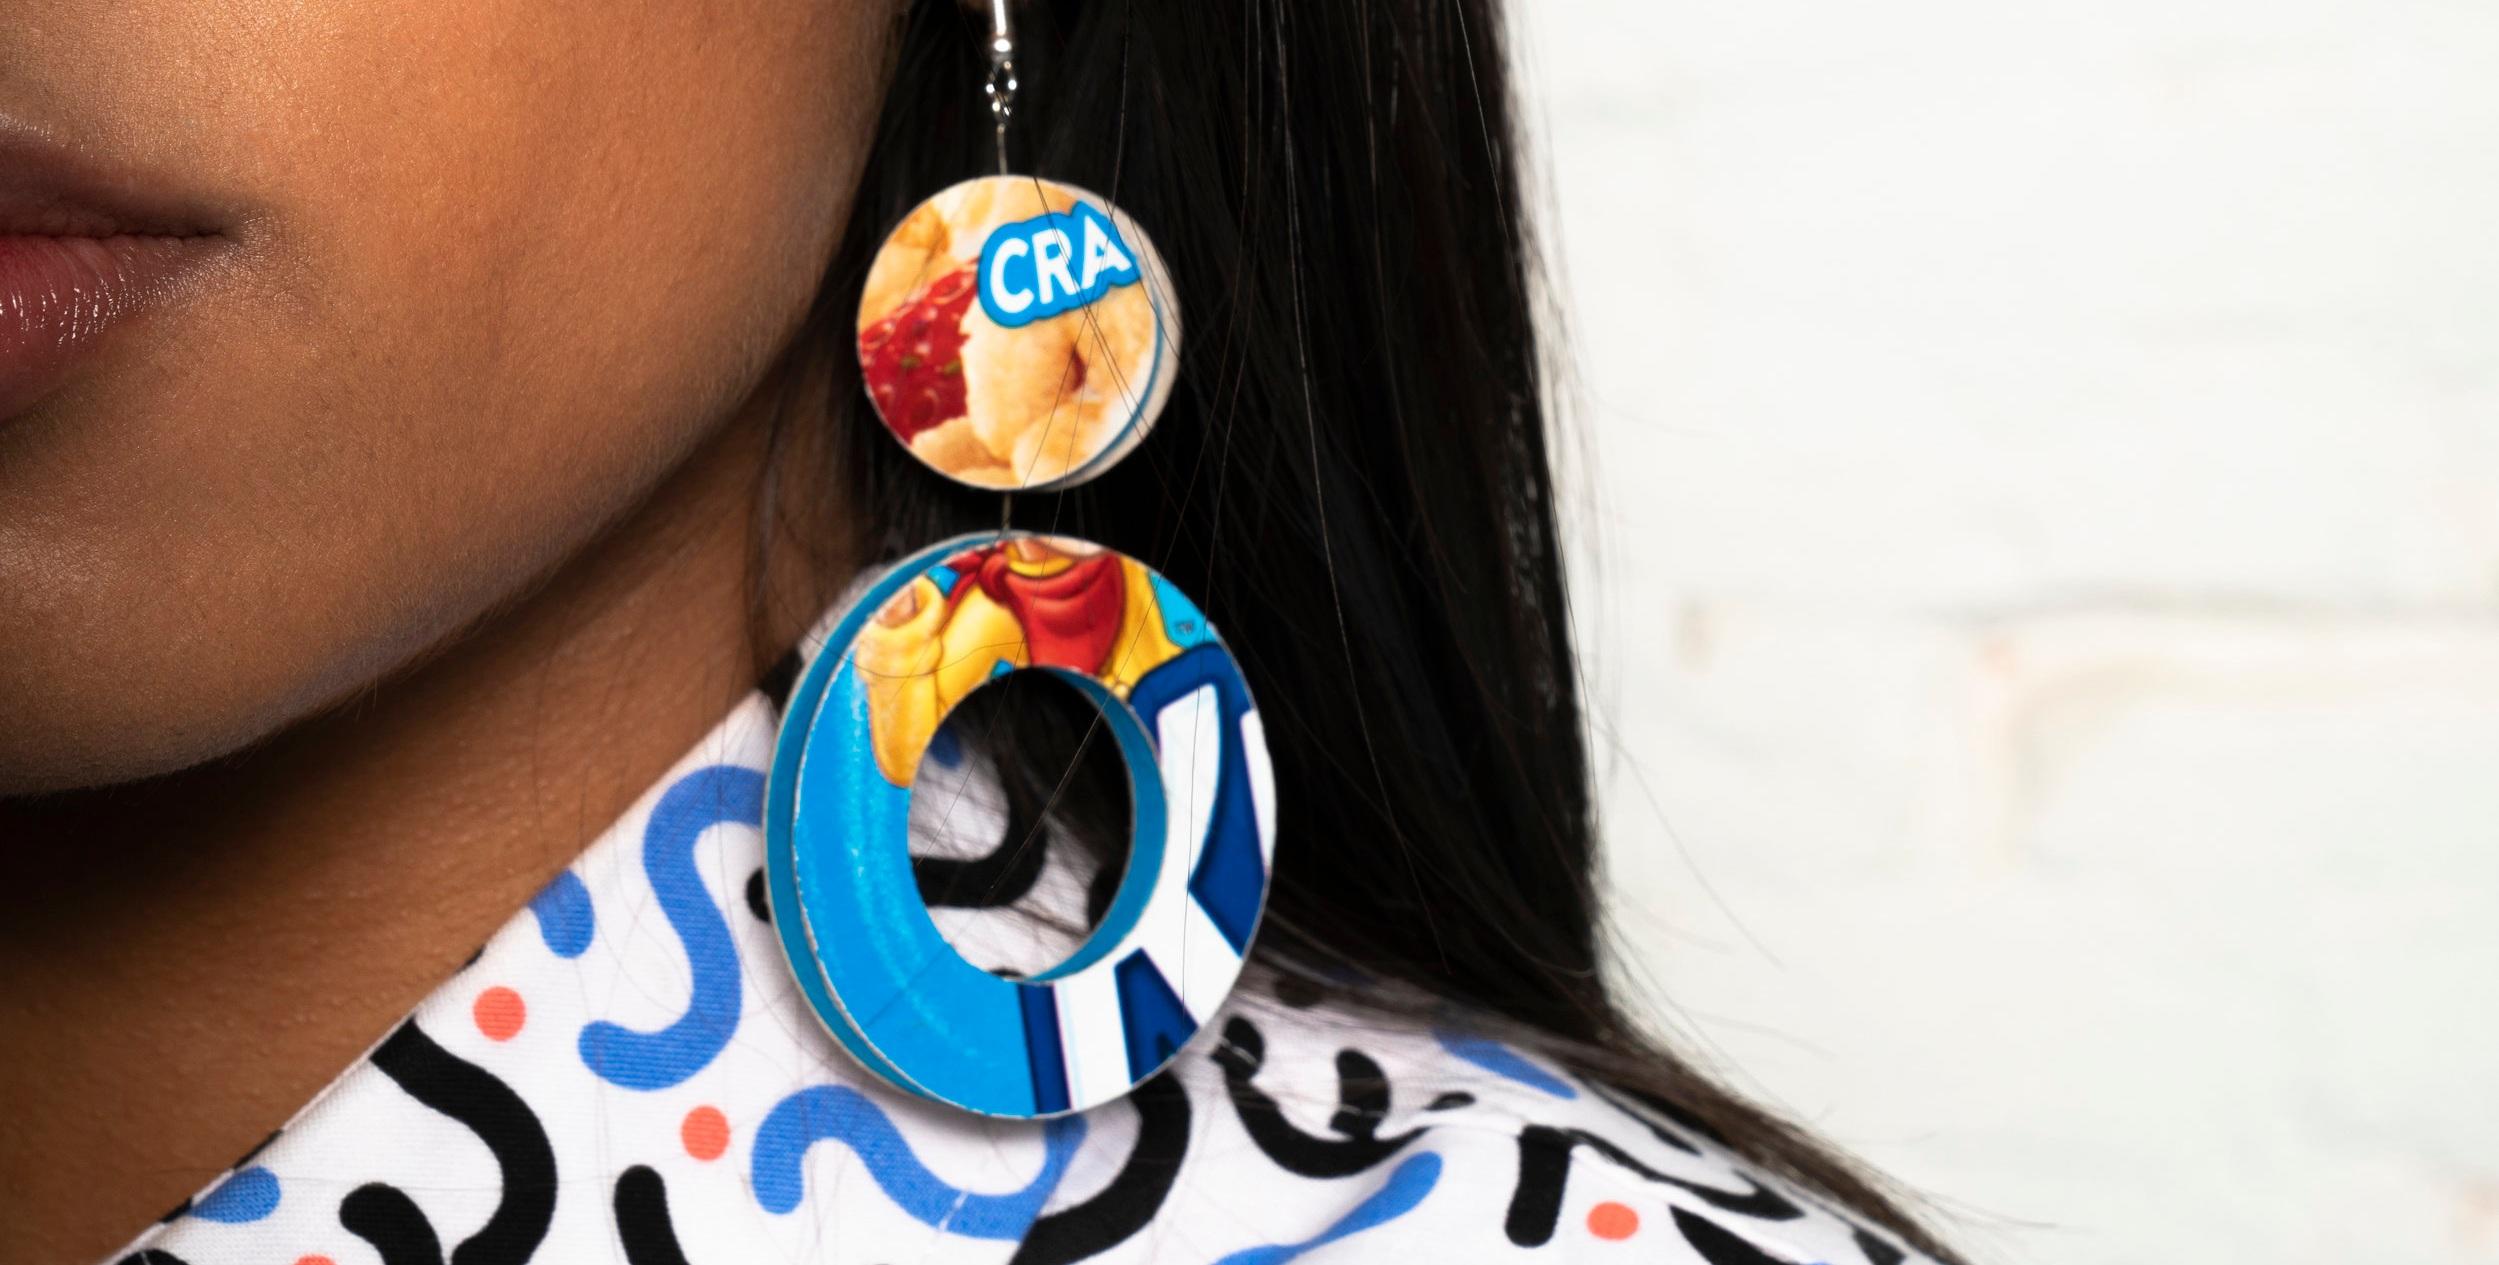 SHOP EARRINGS - Preloved materials